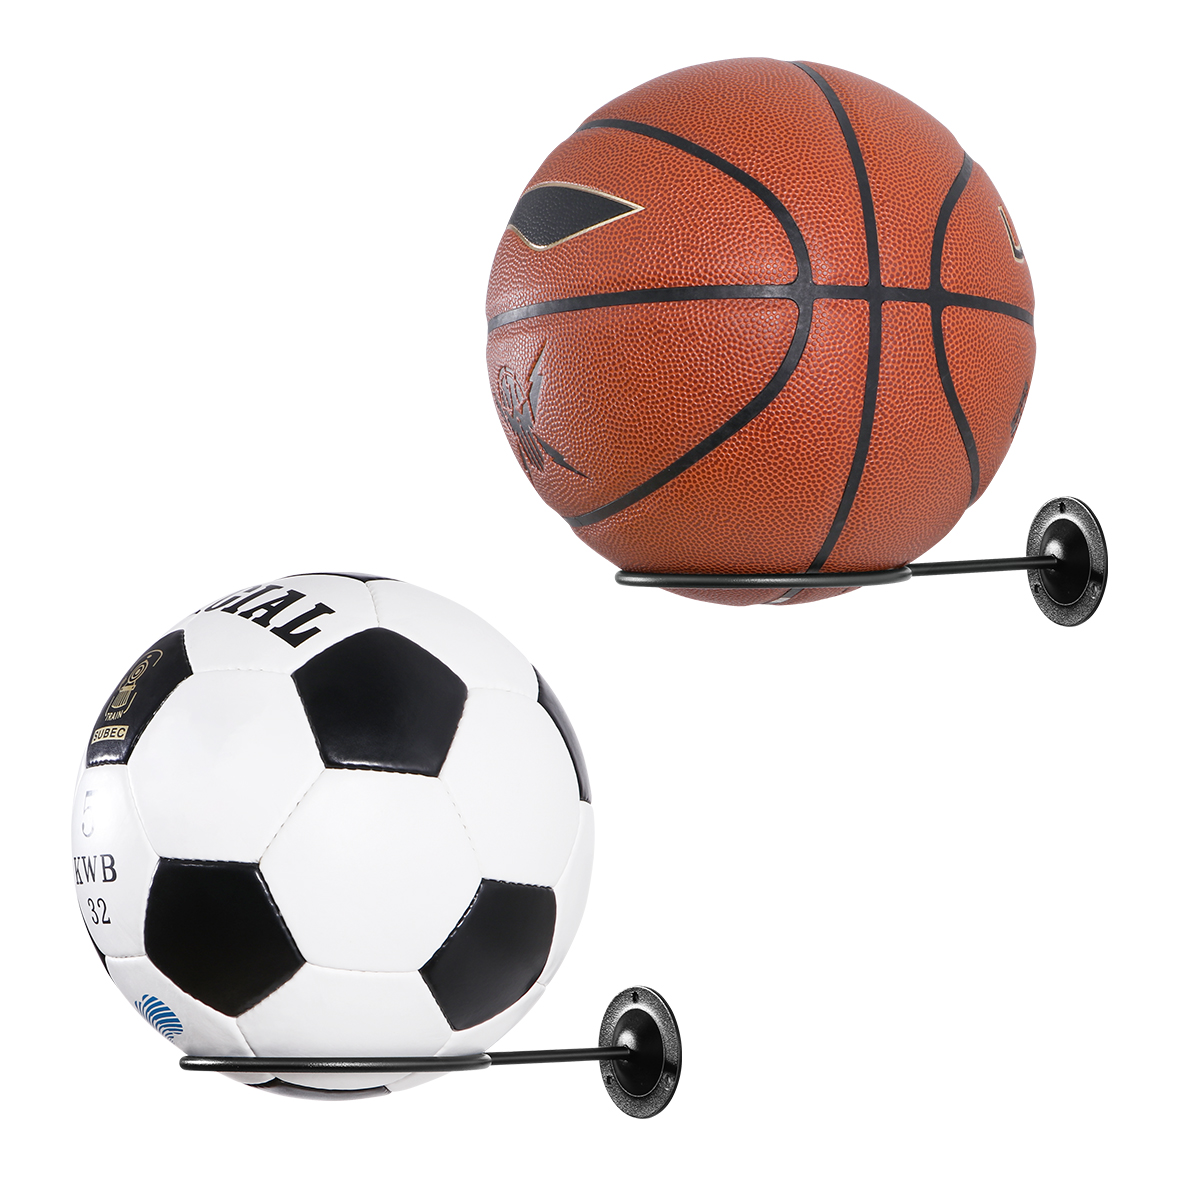 Clispeed 2PCS Wall-Mounted Ball Holders Display Racks For Basketball Soccer Football Volleyball Exercise Ball (Black)